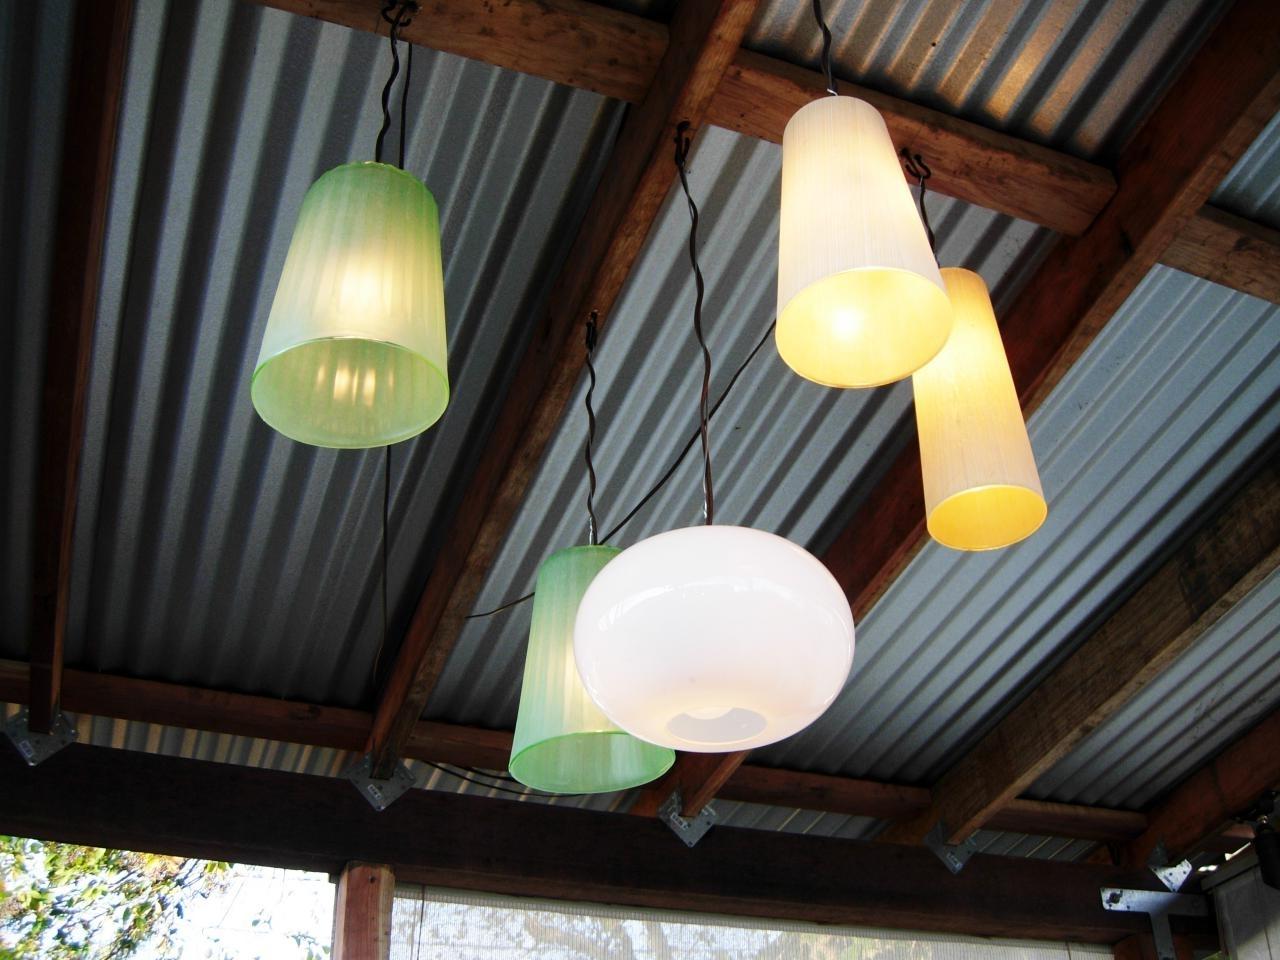 Diy With Regard To Diy Outdoor Ceiling Lights (View 20 of 20)